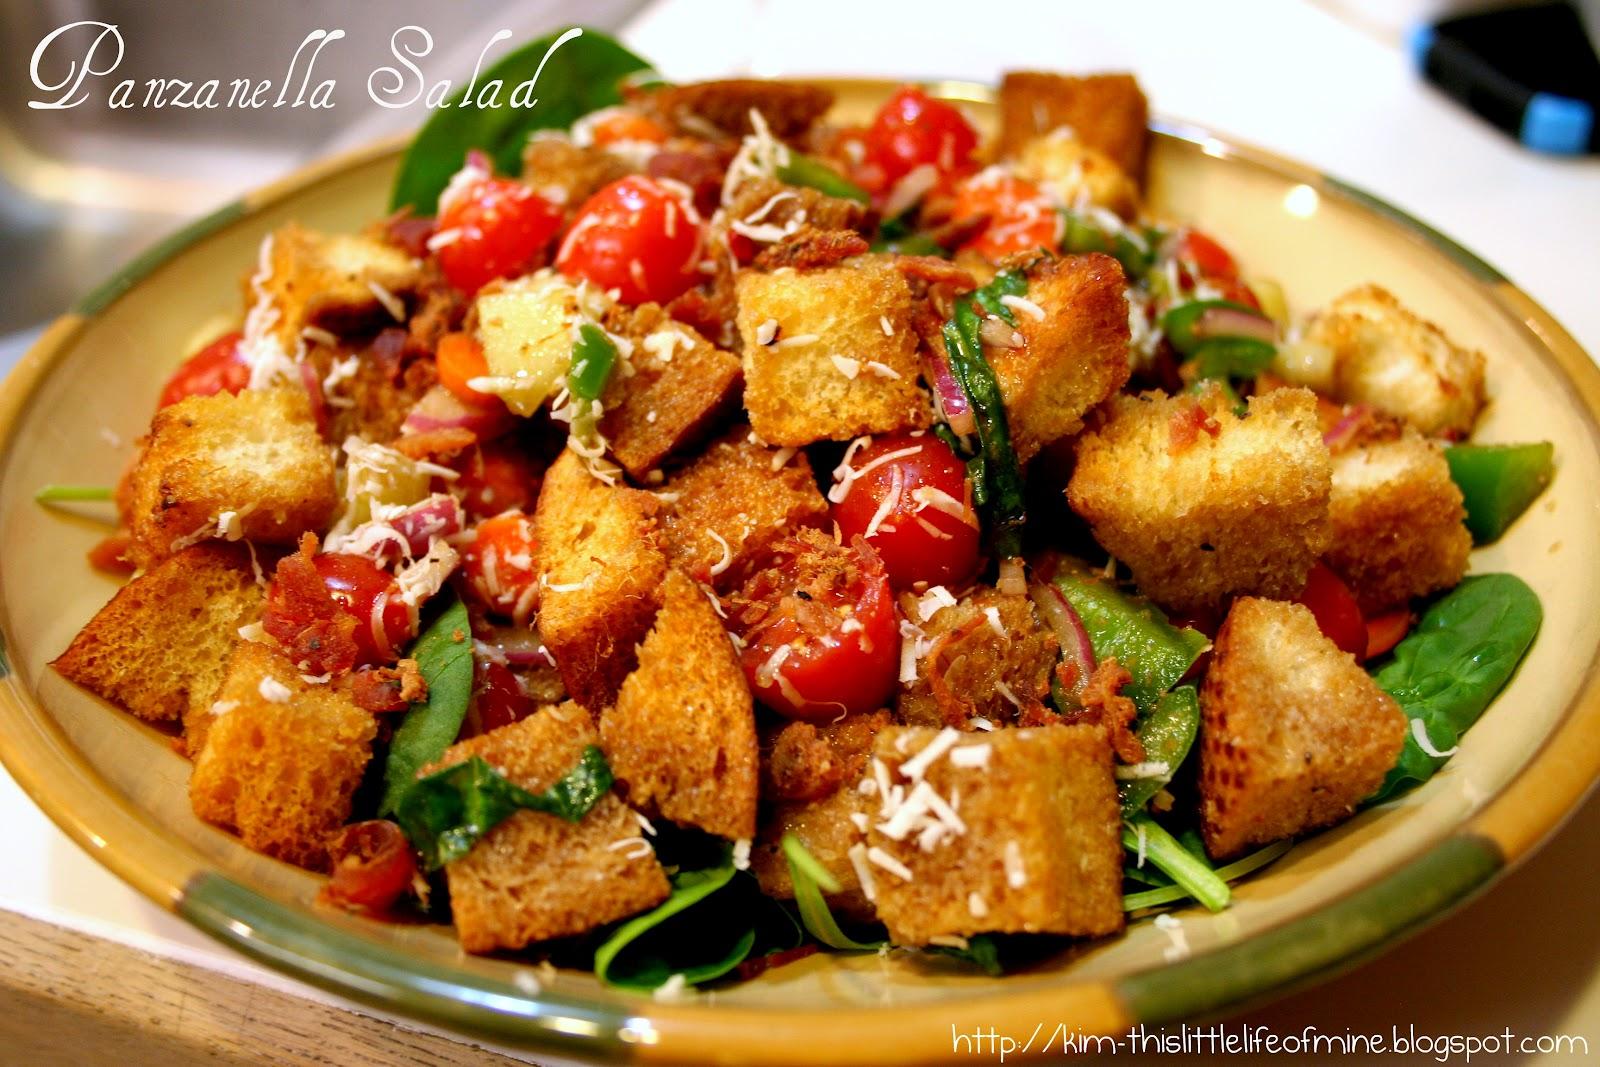 ... panzanella bread salad panzanella bread salad bread salad panzanella